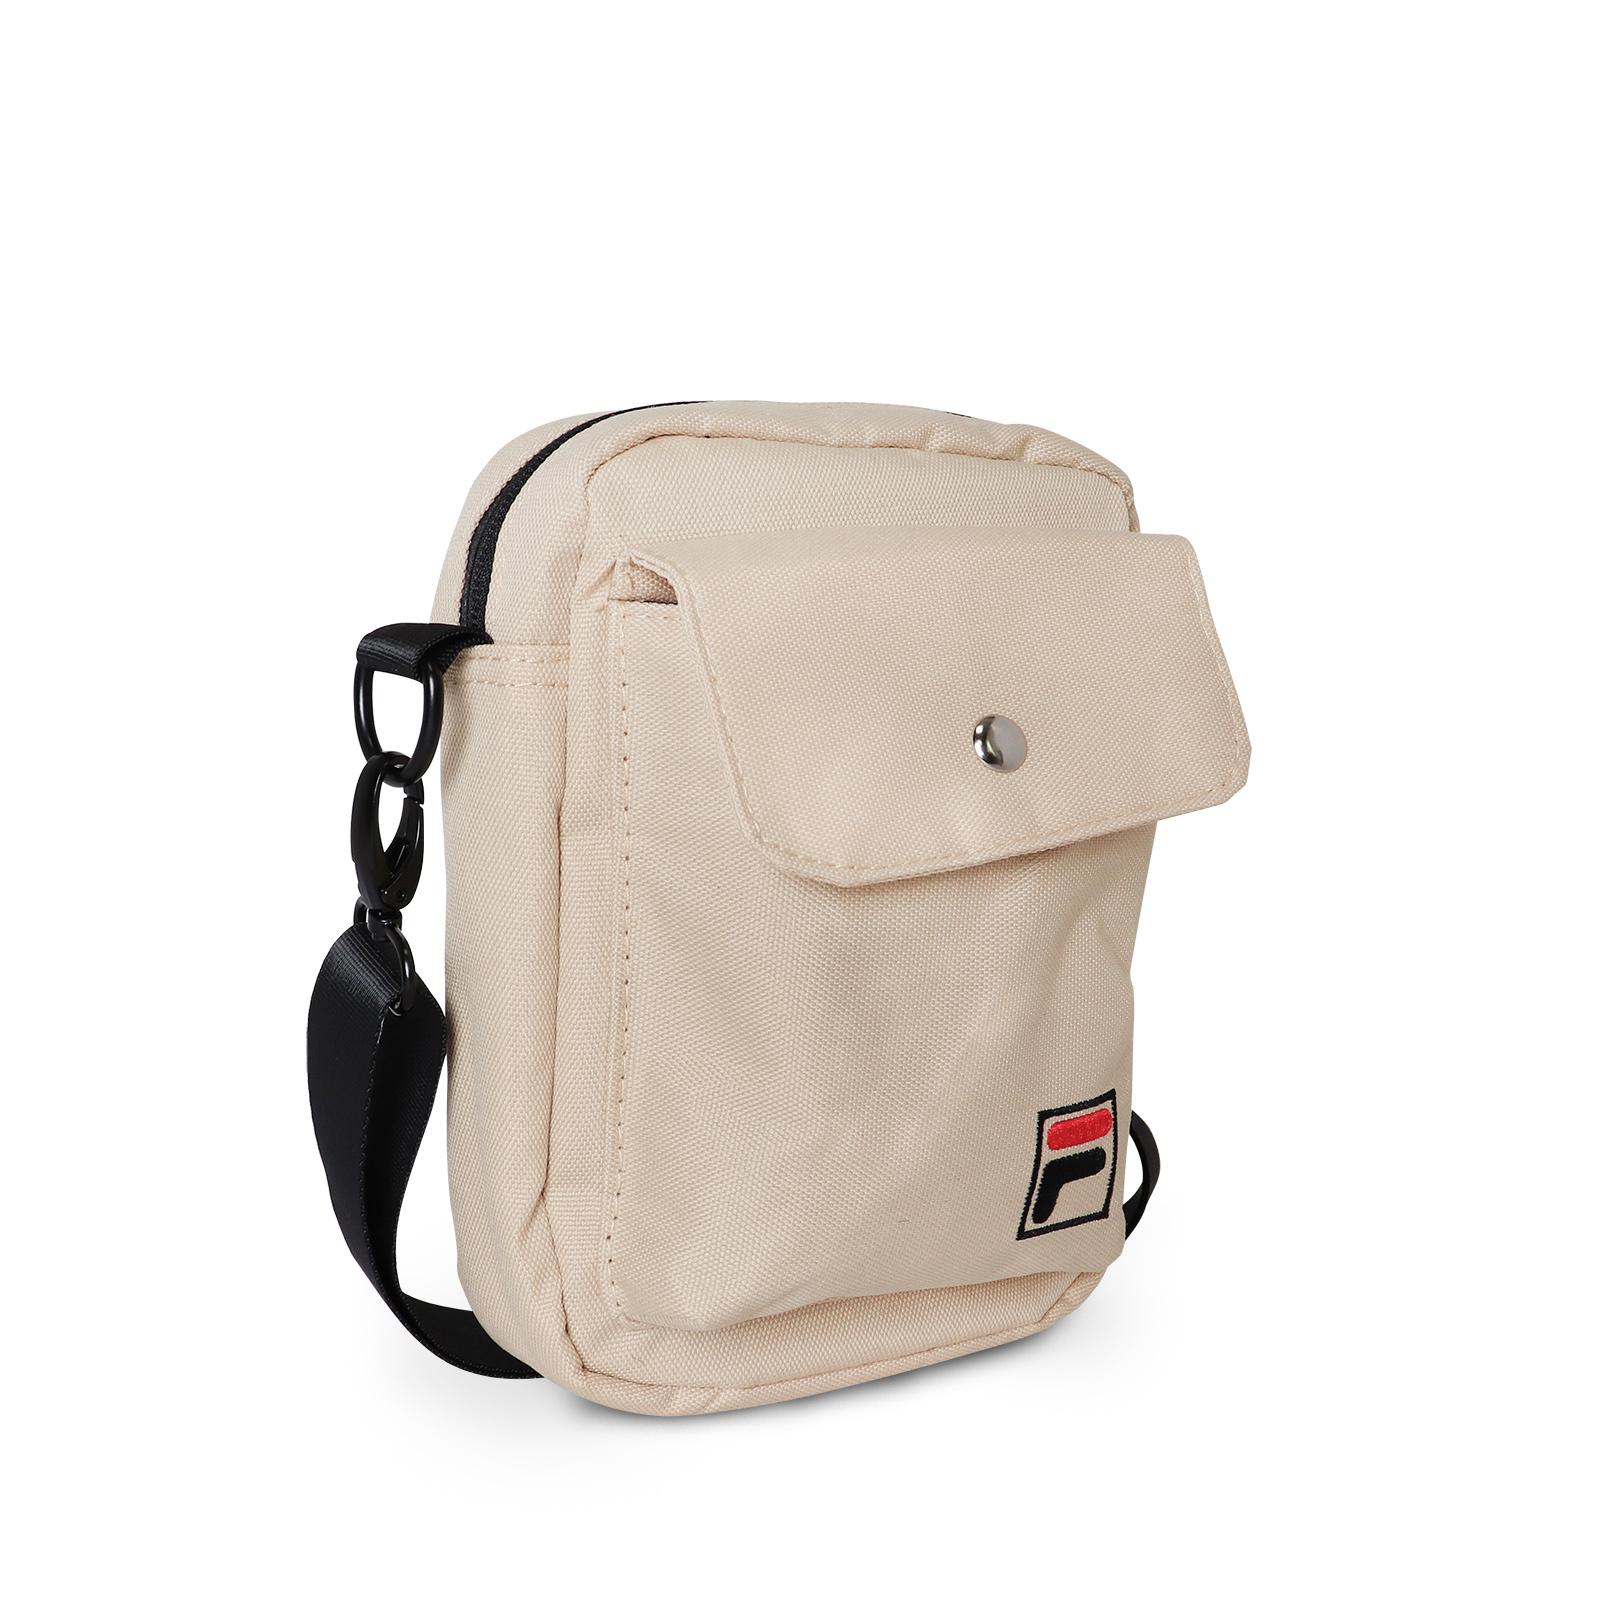 FILA 斜背包 Crossbody Shoulder Bag 卡其 奶茶 男女款 側背【ACS】BMV3014KK